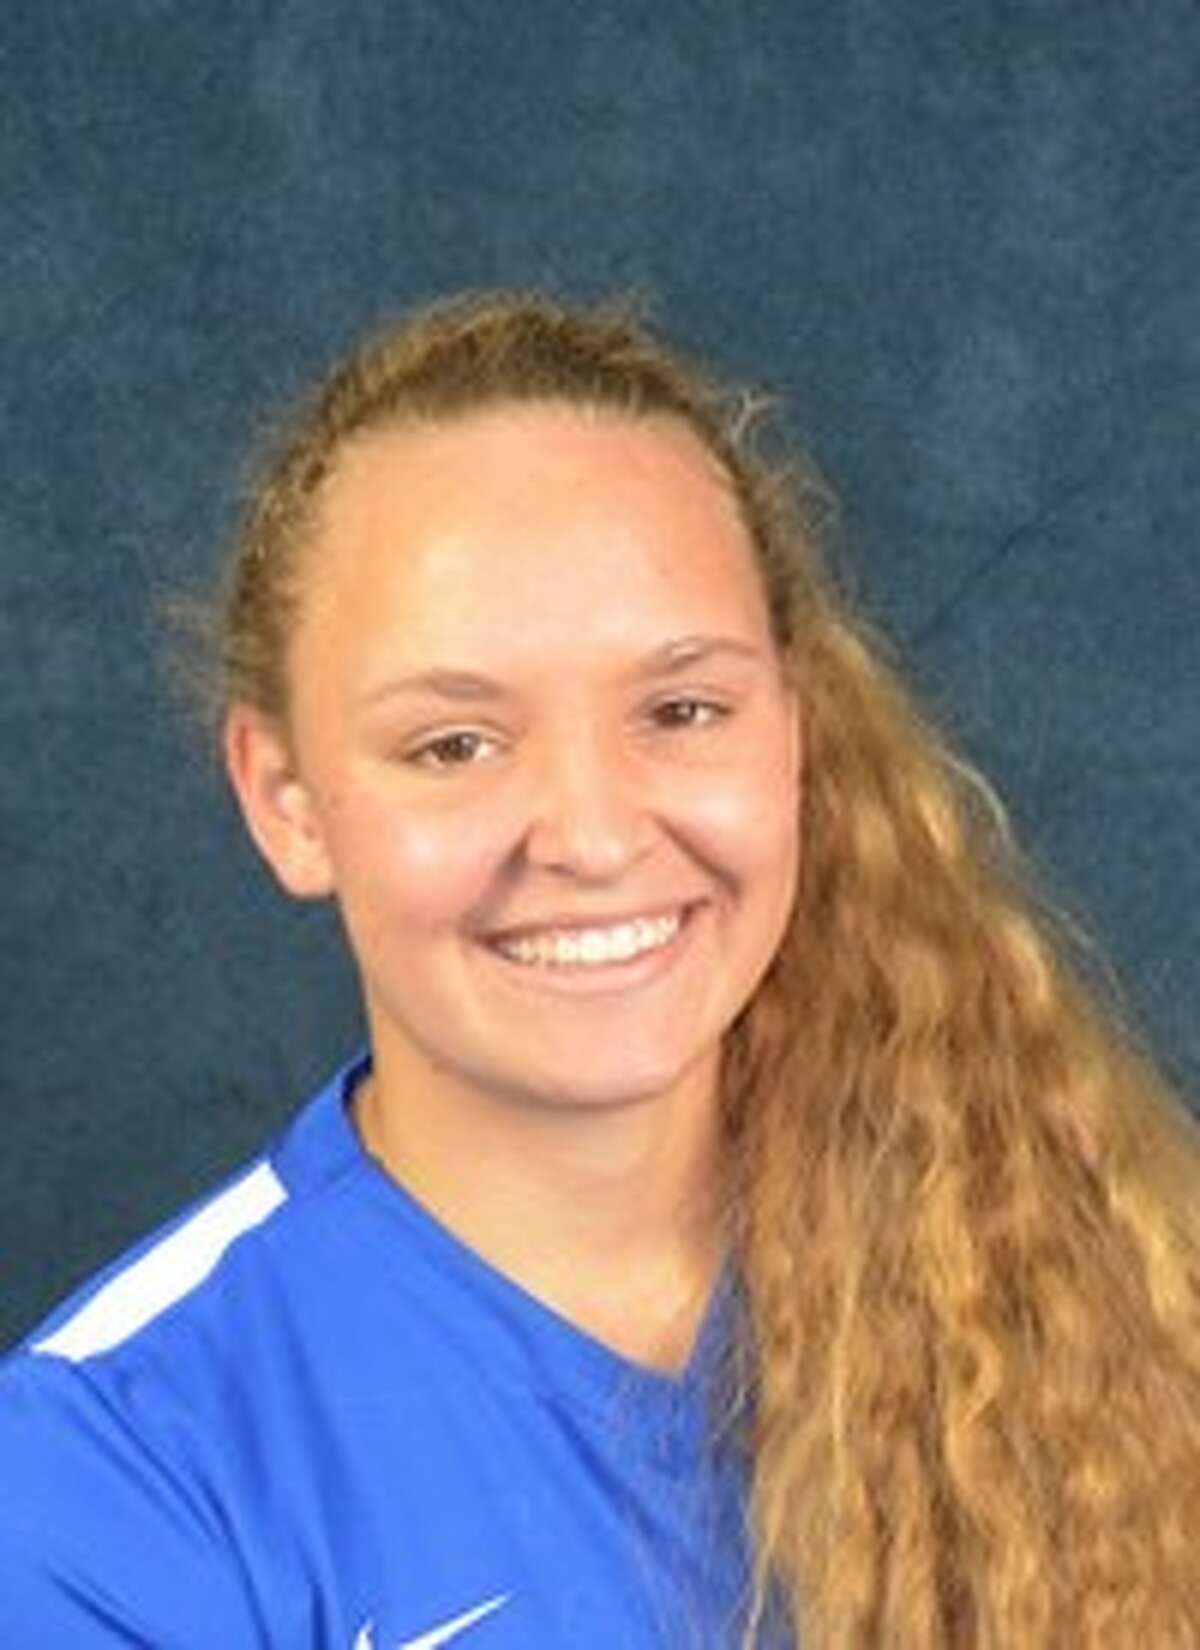 LaTourneau womens soccer player Rebekah Stevenson. Conroe High School graduate 2016.